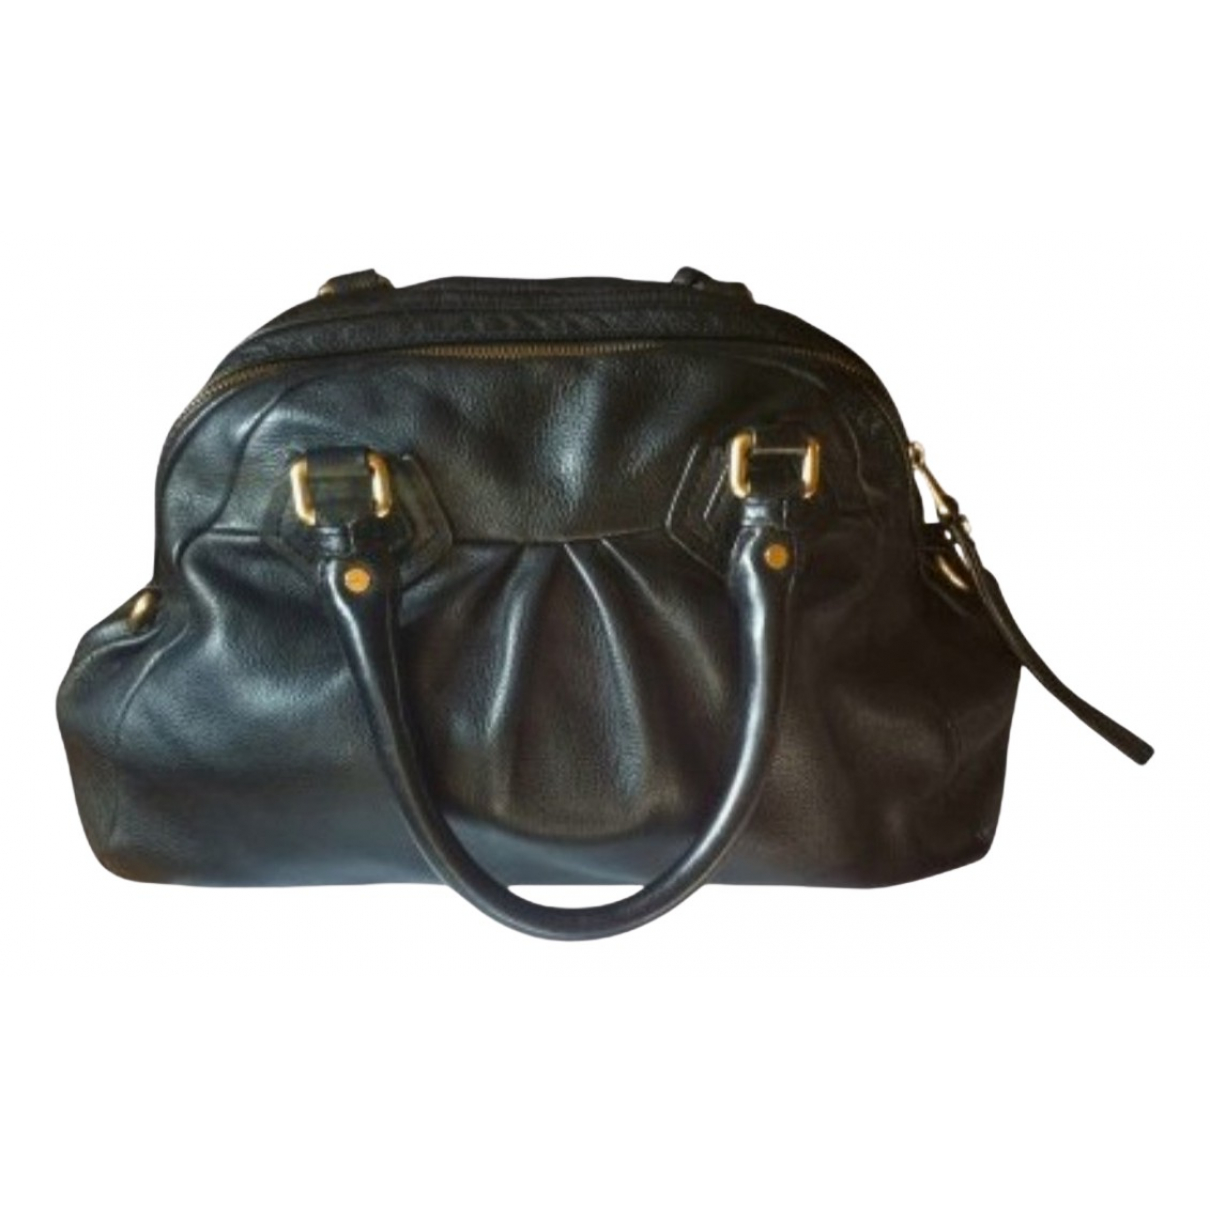 Marc By Marc Jacobs N Black Leather handbag for Women N